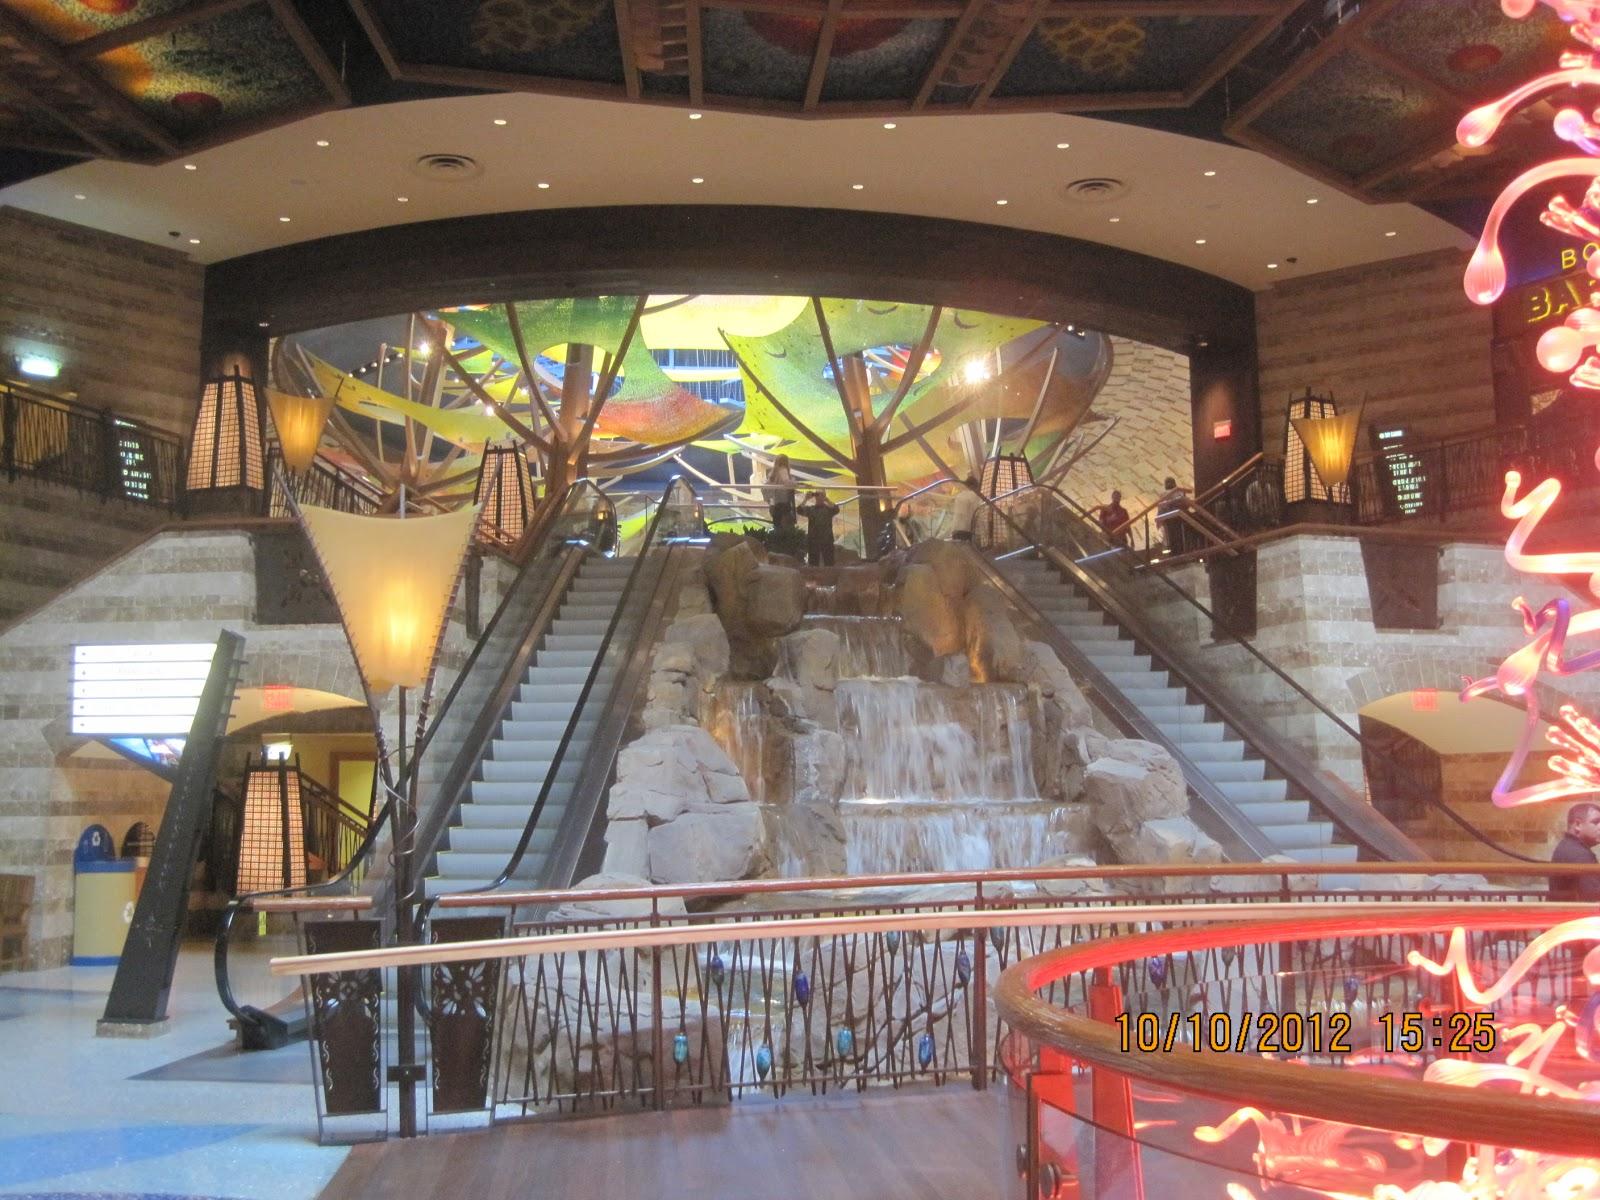 Mohegan sun casino florida online gambling legalization